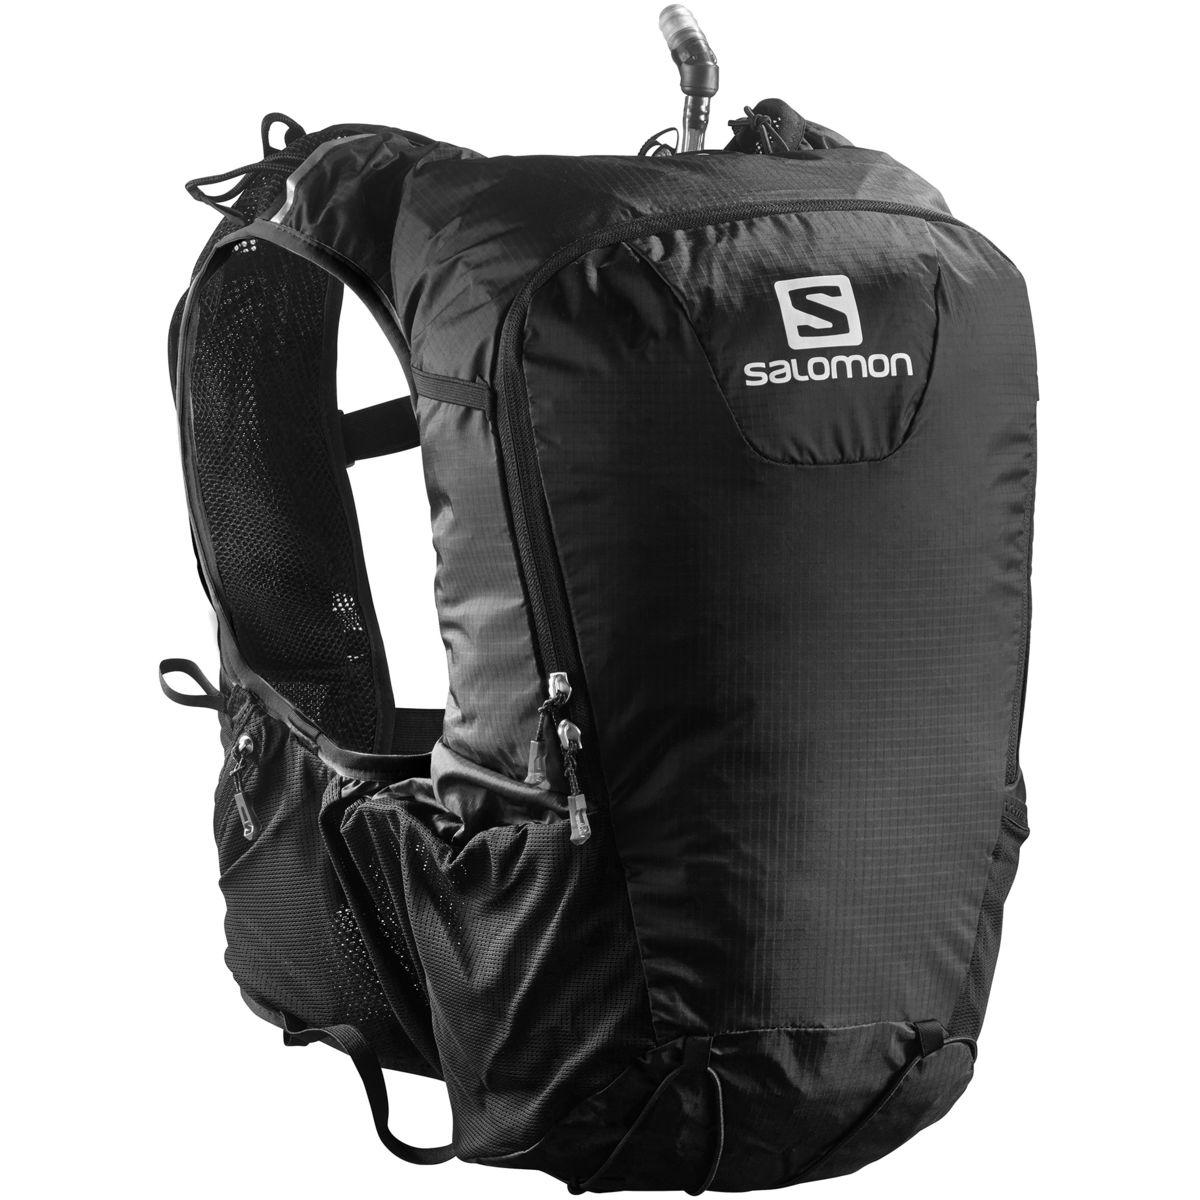 Salomon Skin Pro 15 Set